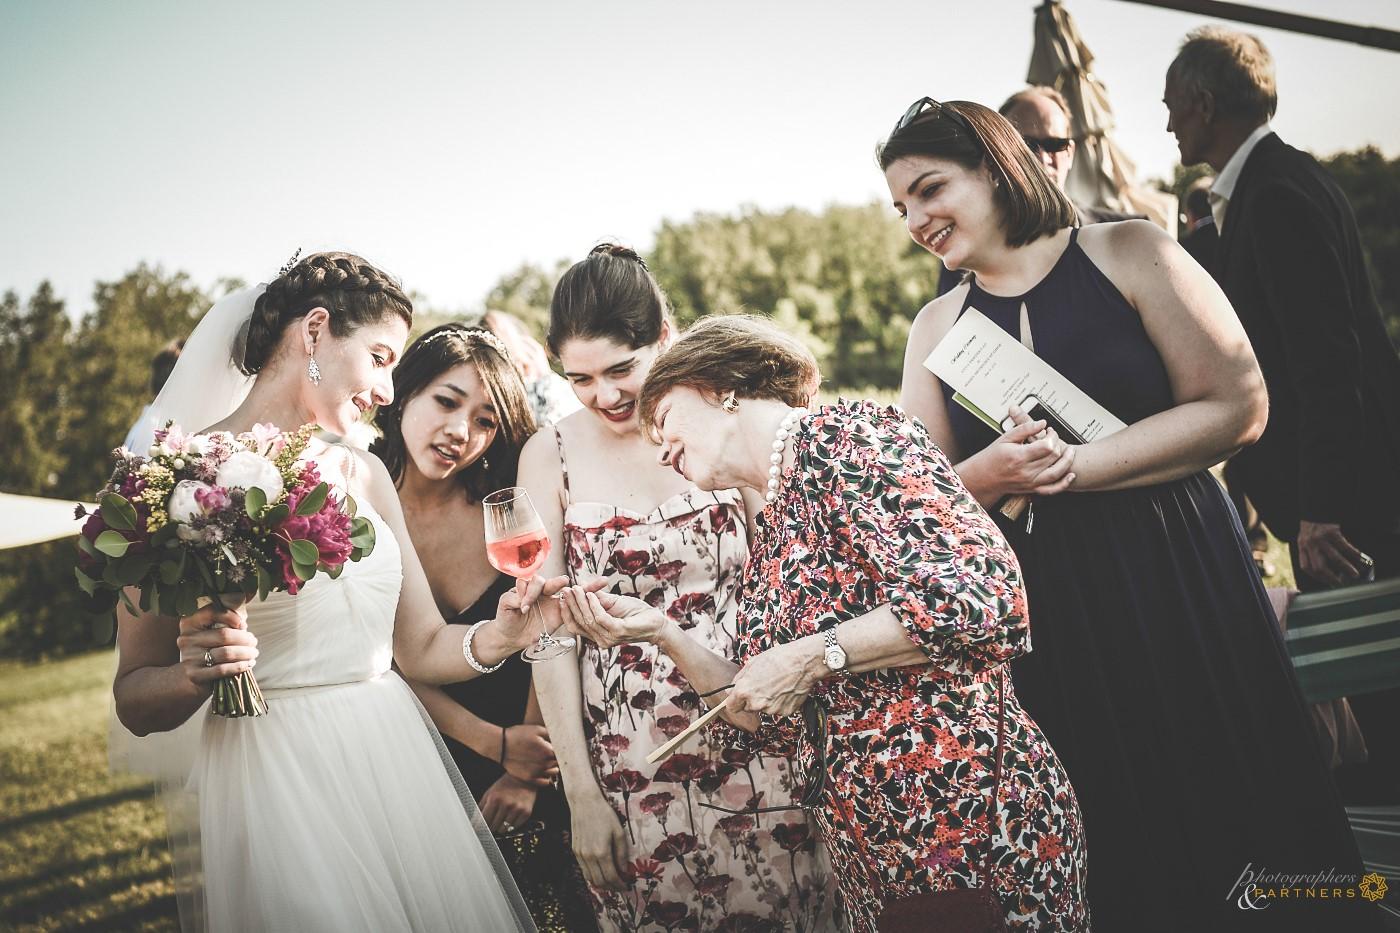 photographers_weddings_italy_11.jpg